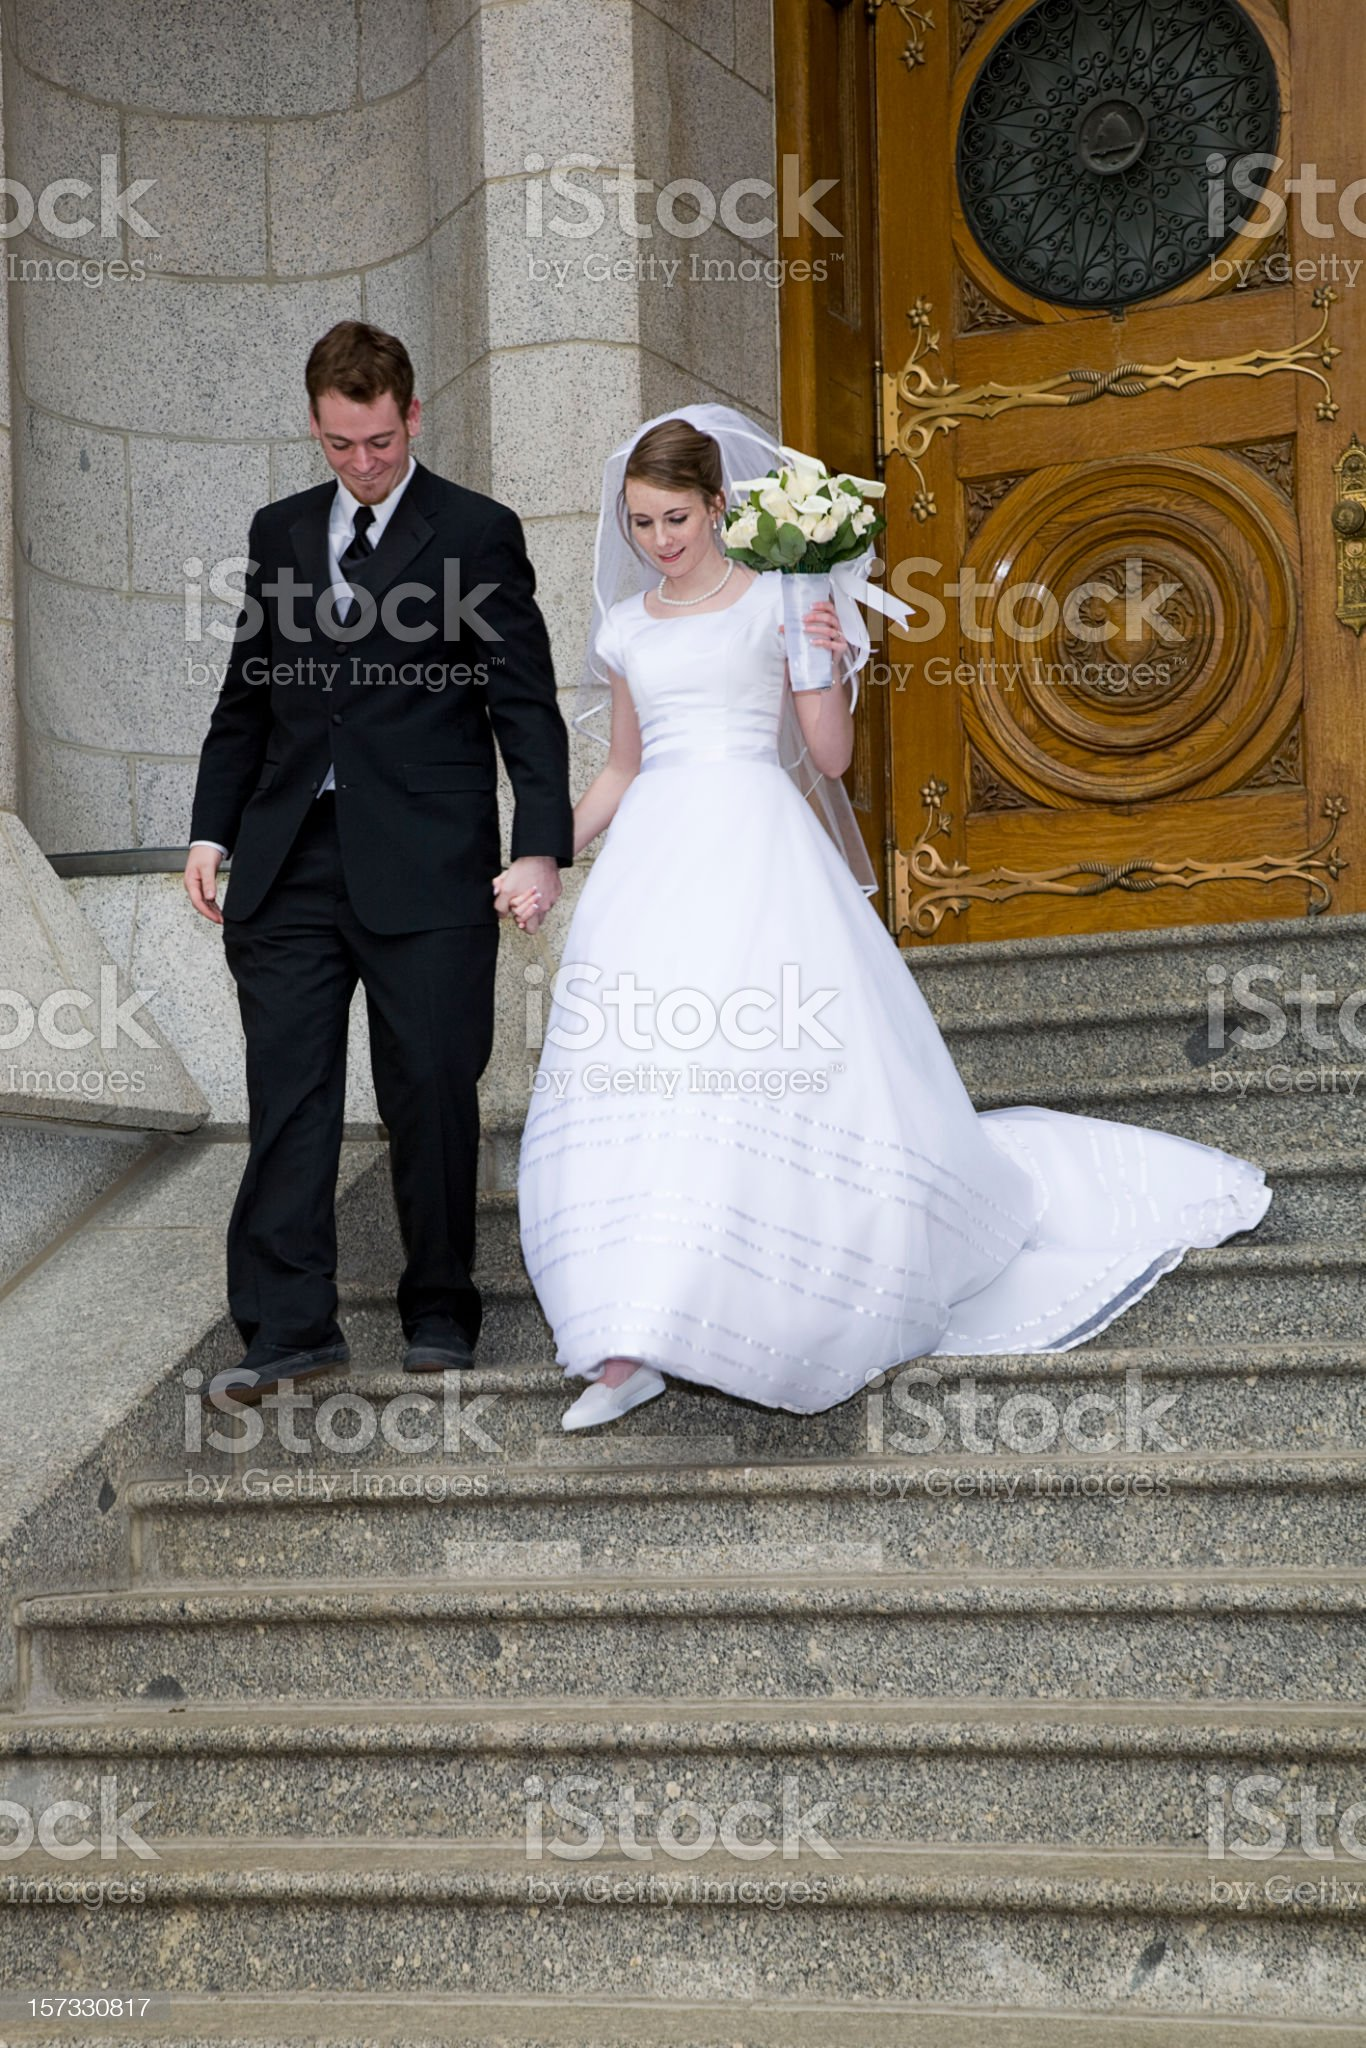 Bride and Groom in Doorway royalty-free stock photo